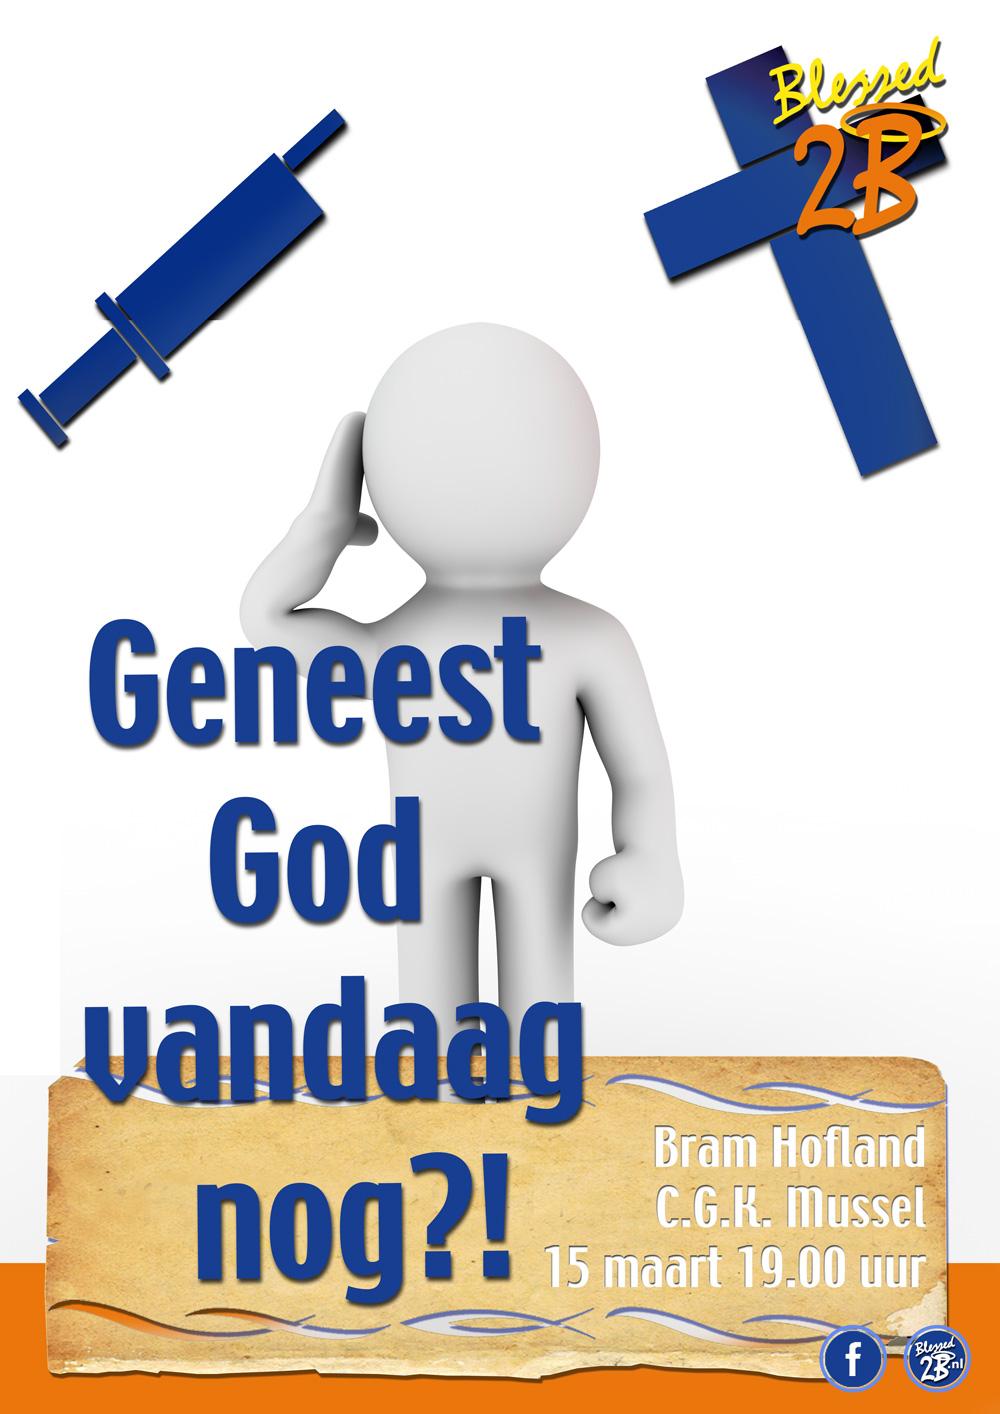 Geneest-God-Vandaag-Nog-!